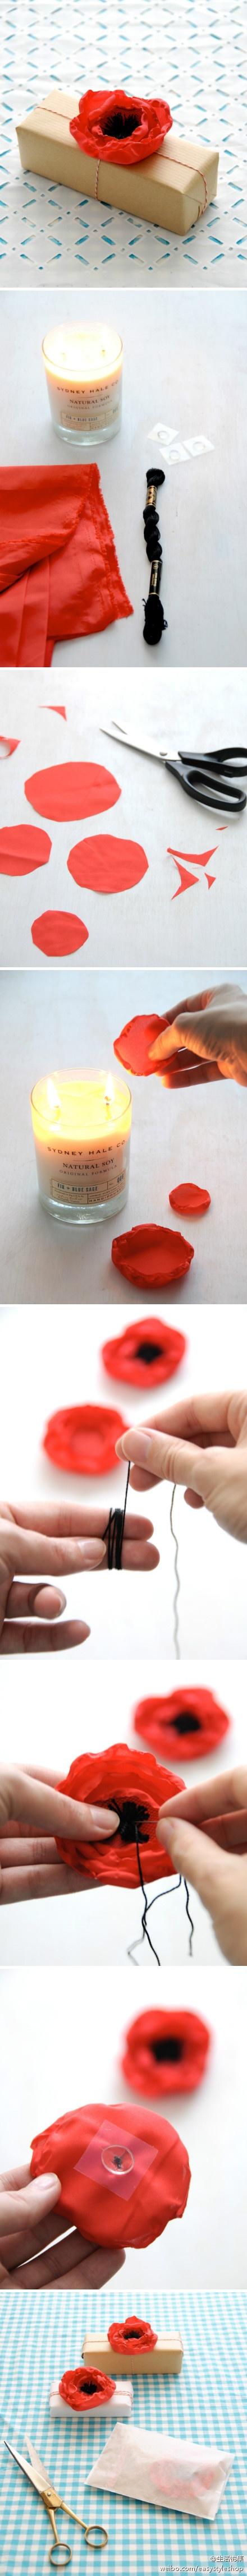 fabric anemones